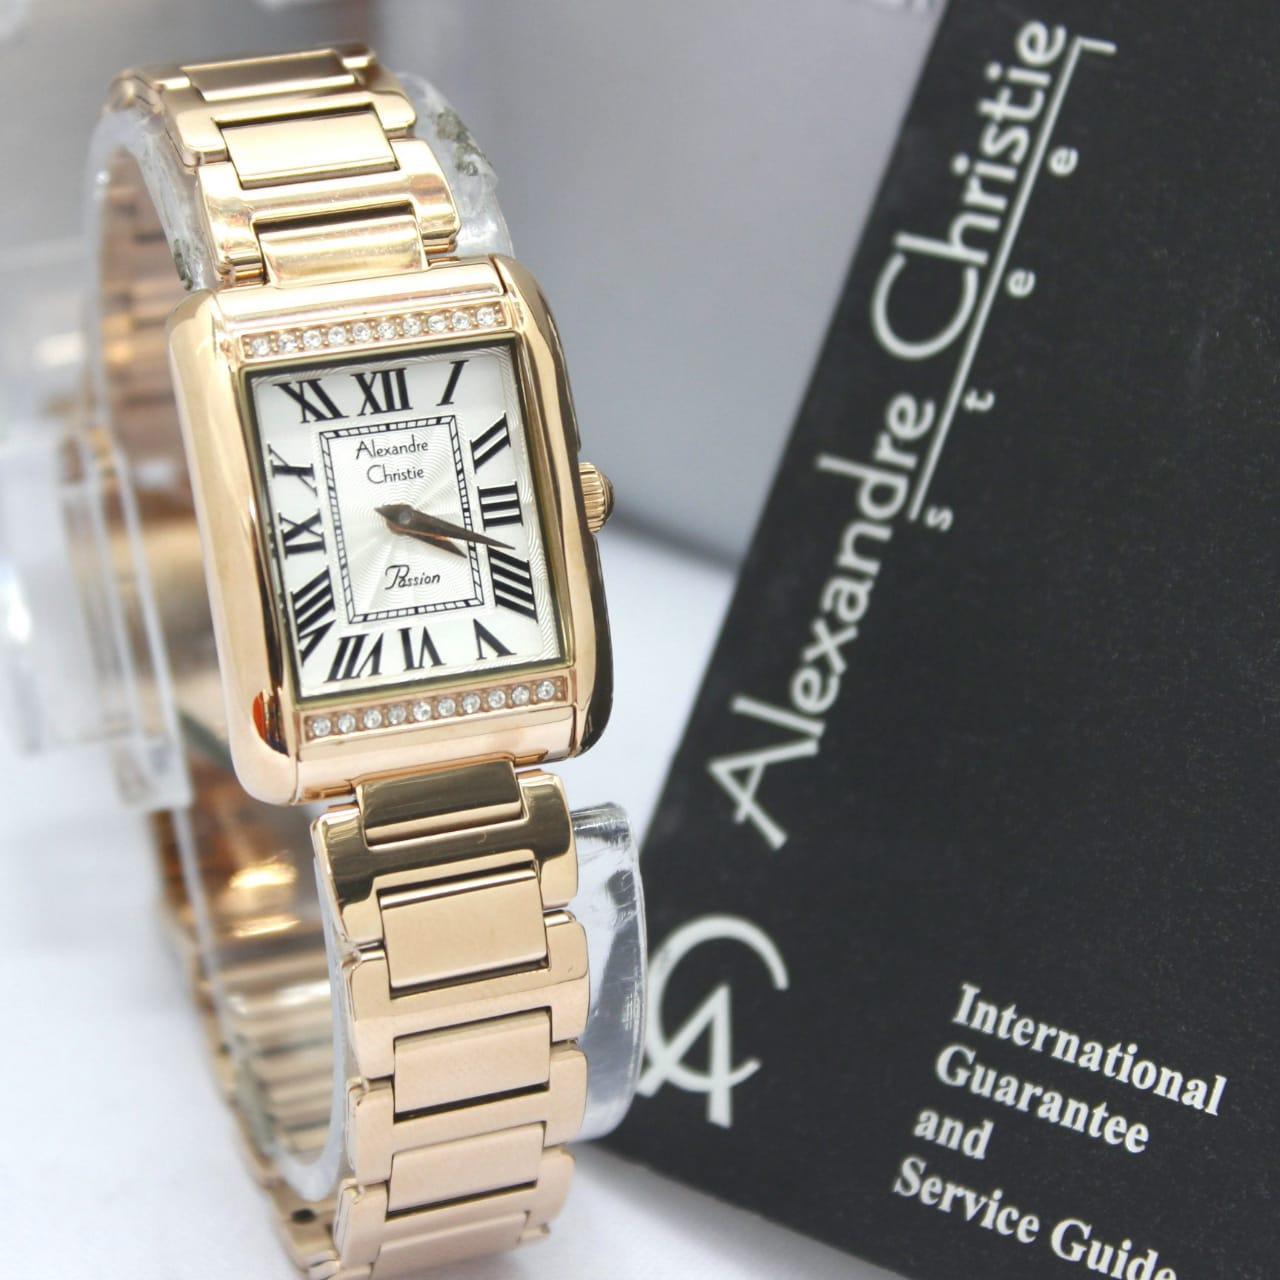 Alexandre Christie Original Watch - AC 2660LH - Jam Tangan Wanita - Stainlesstell Strap